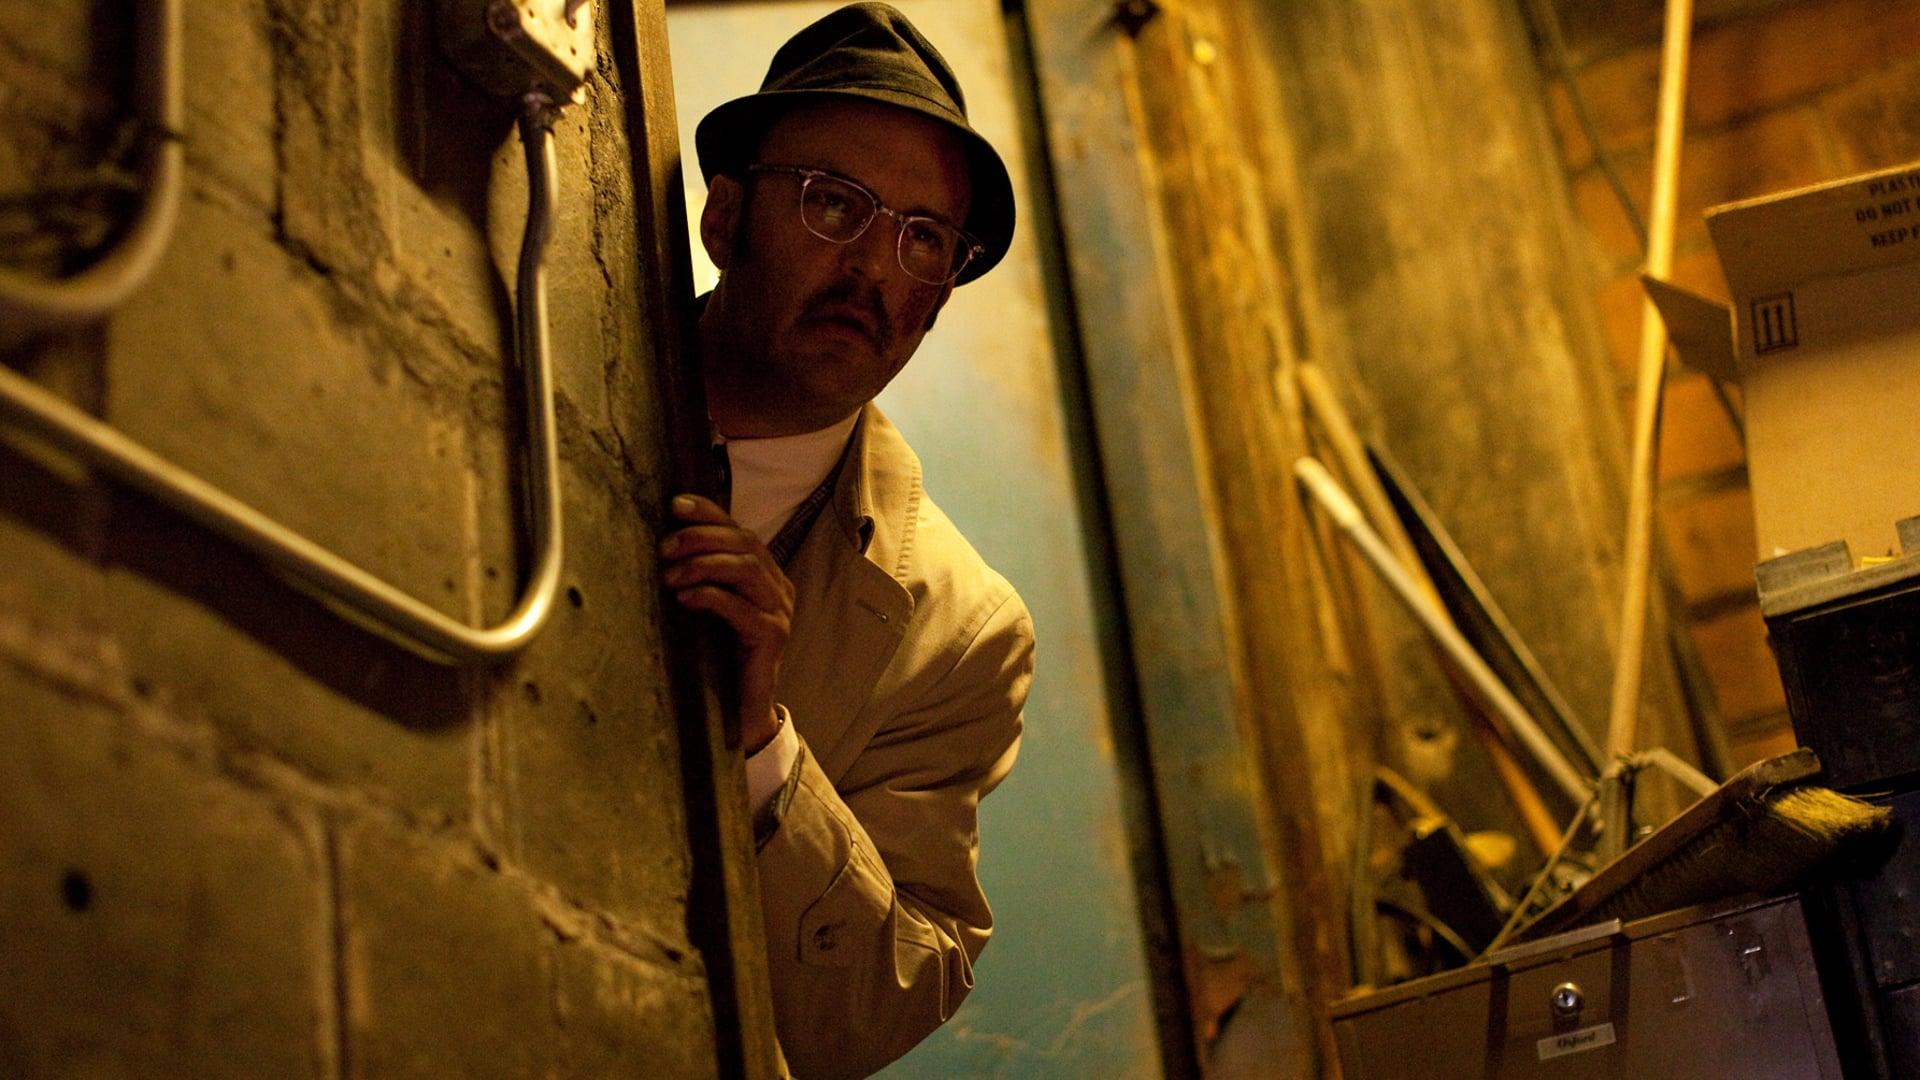 Karl Manhair, Postal Inspector trailer